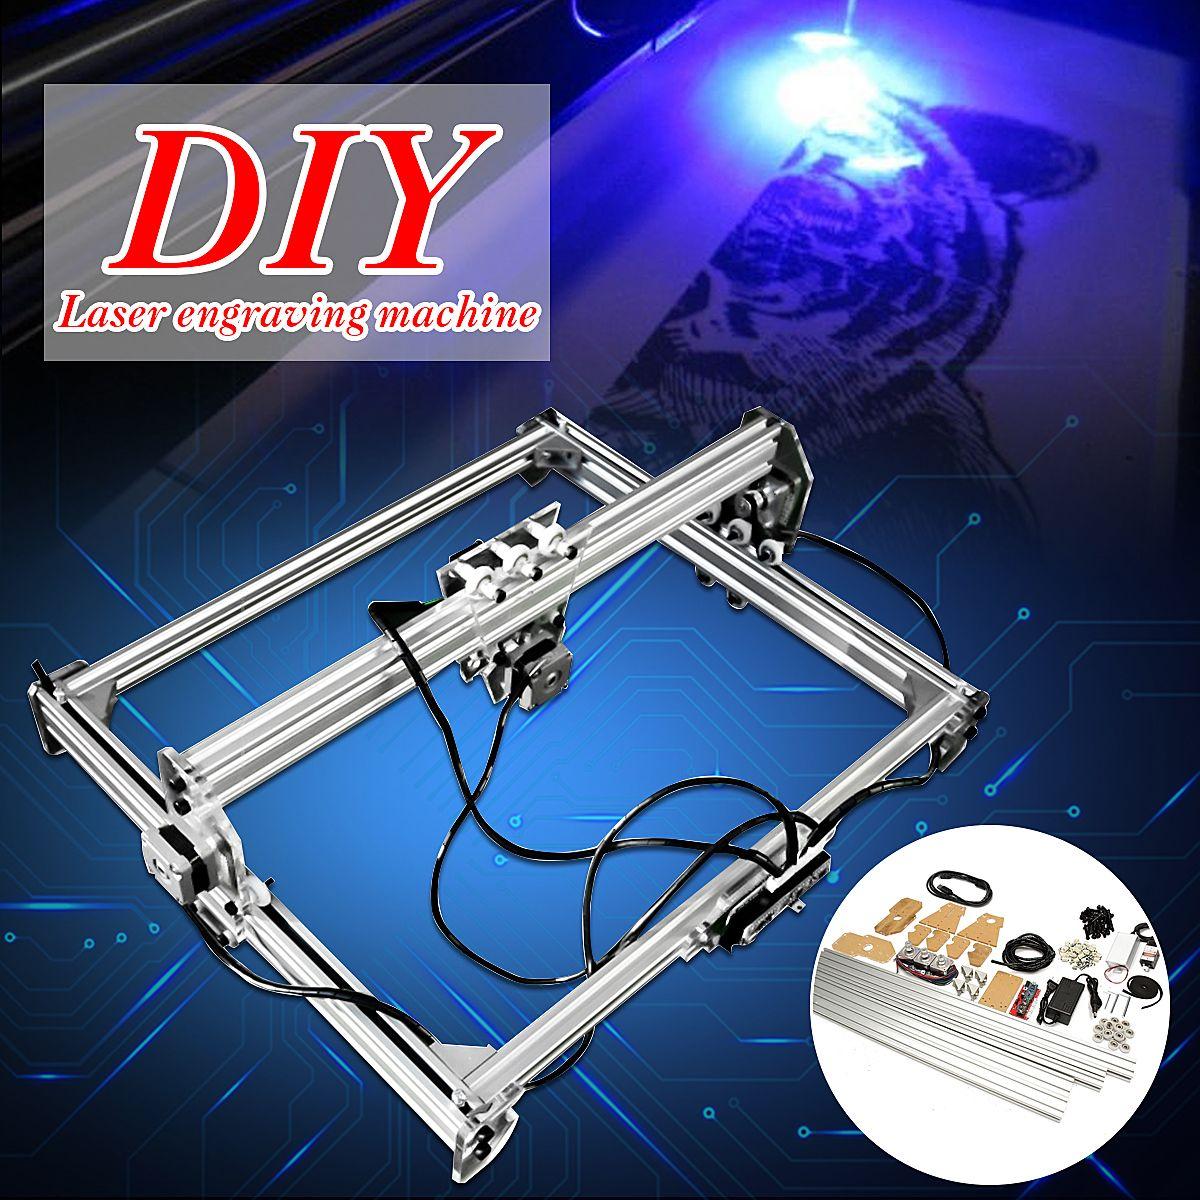 50*65cm Mini 3000MW Blue CNC Laser Engraving Machine 2Axis DC 12V DIY Engraver Desktop Wood Router/Cutter/Printer+ Laser Goggles